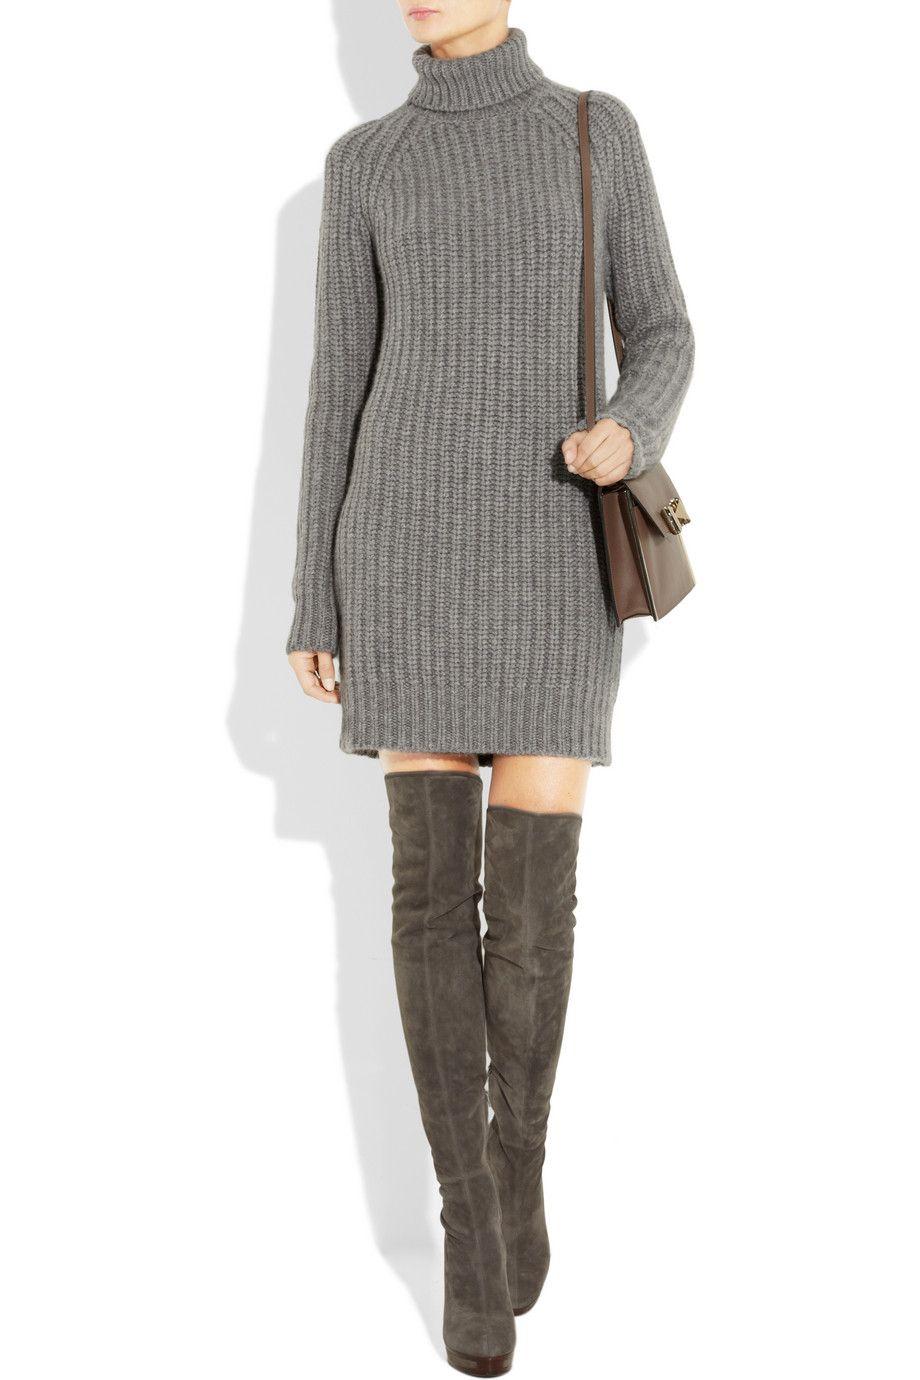 b2da6fd3f62 Knitted Cashmere Turtleneck Sweater Dress by Michael Kors